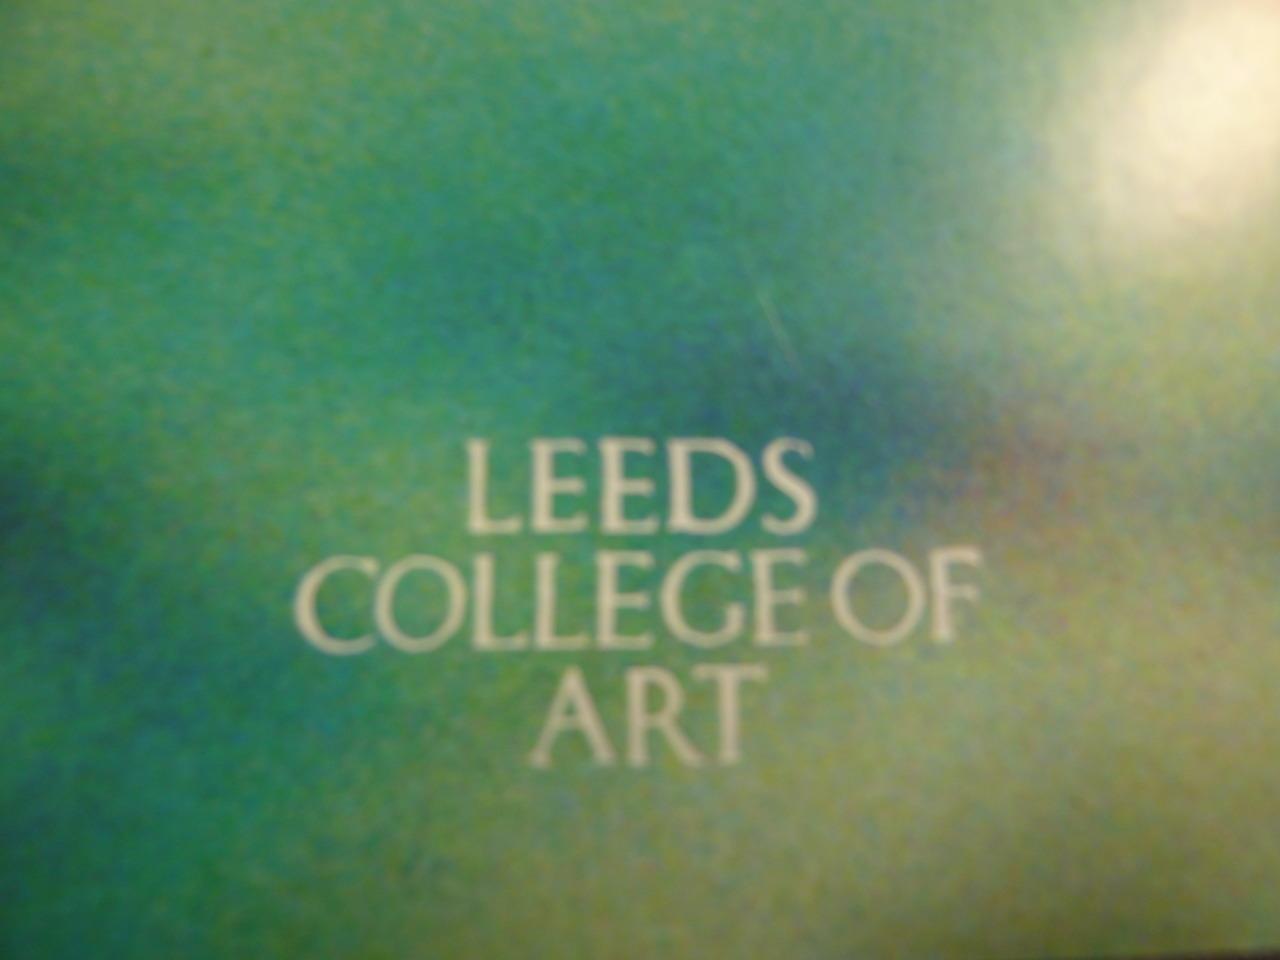 28th november at 2 AM   lecture at Leeds College of Arts, Leeds UK    http://www.leeds-art.ac.uk/